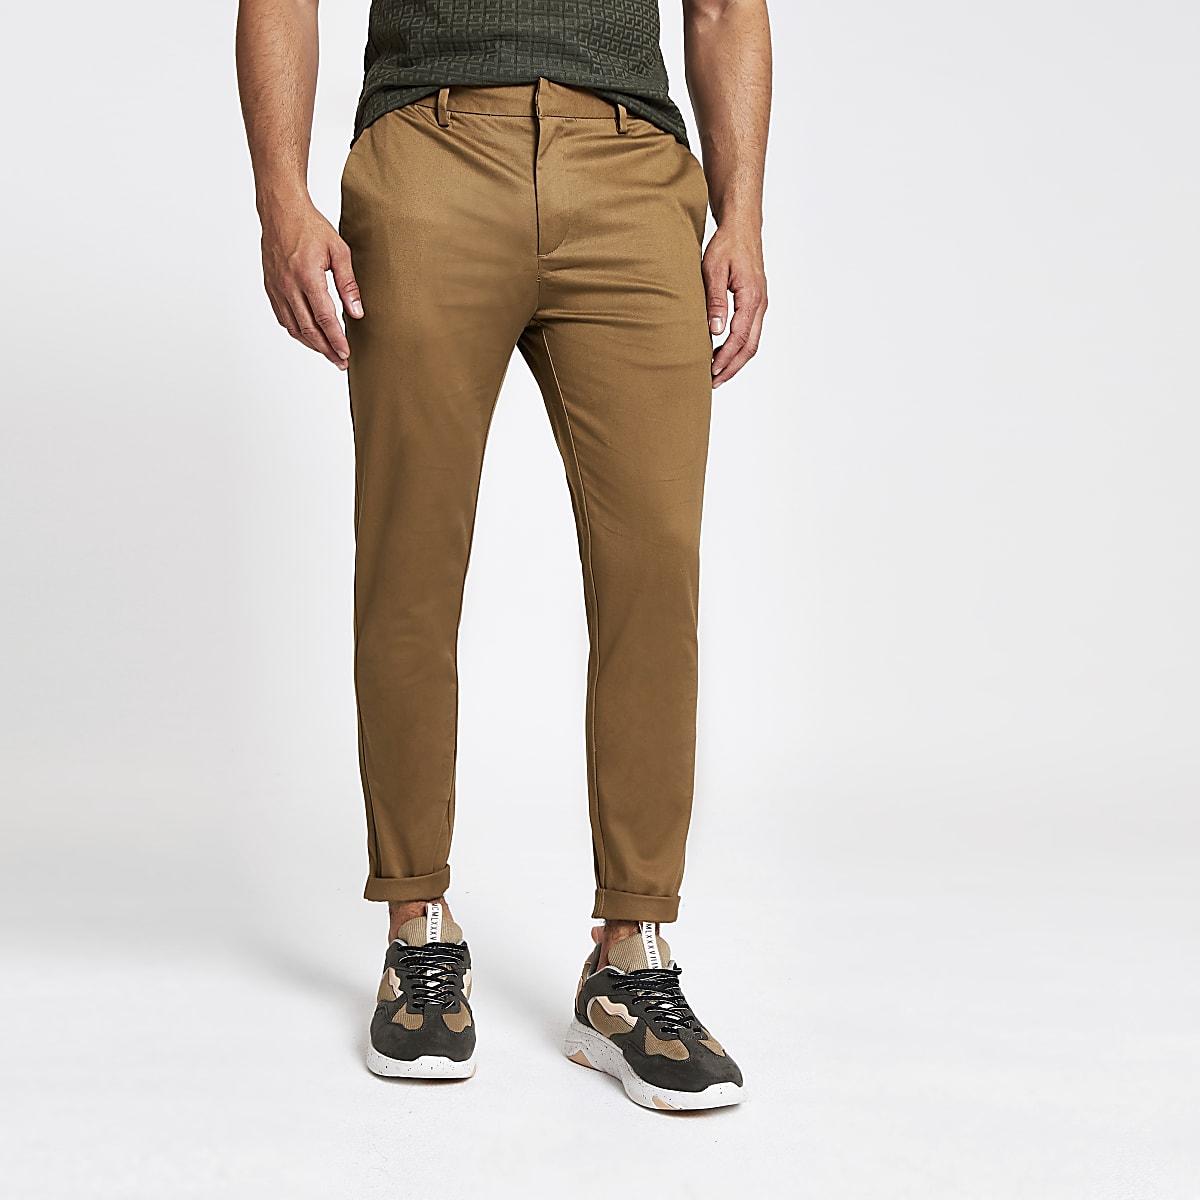 Pantalon chino court skinny marron clair